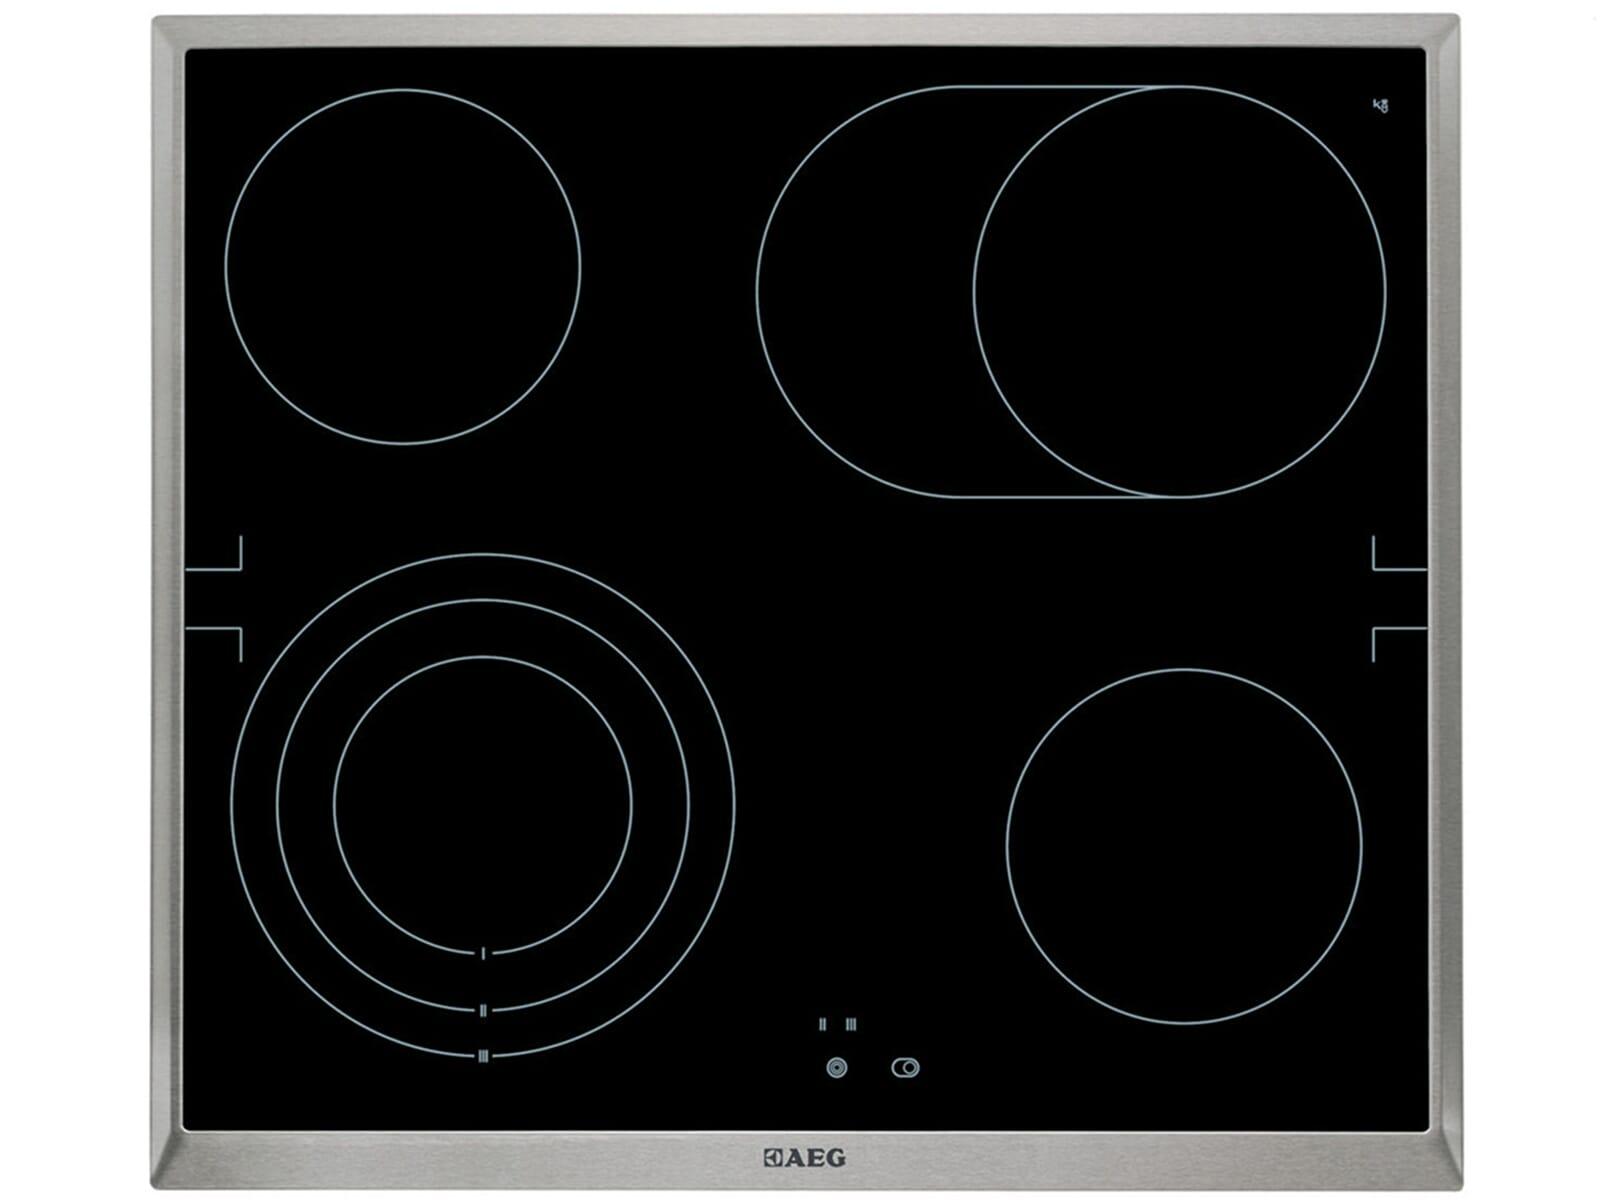 Einbau küchengeräte set  AEG EEB352 Set SteamBake Einbau Herd EEB351010M + ...